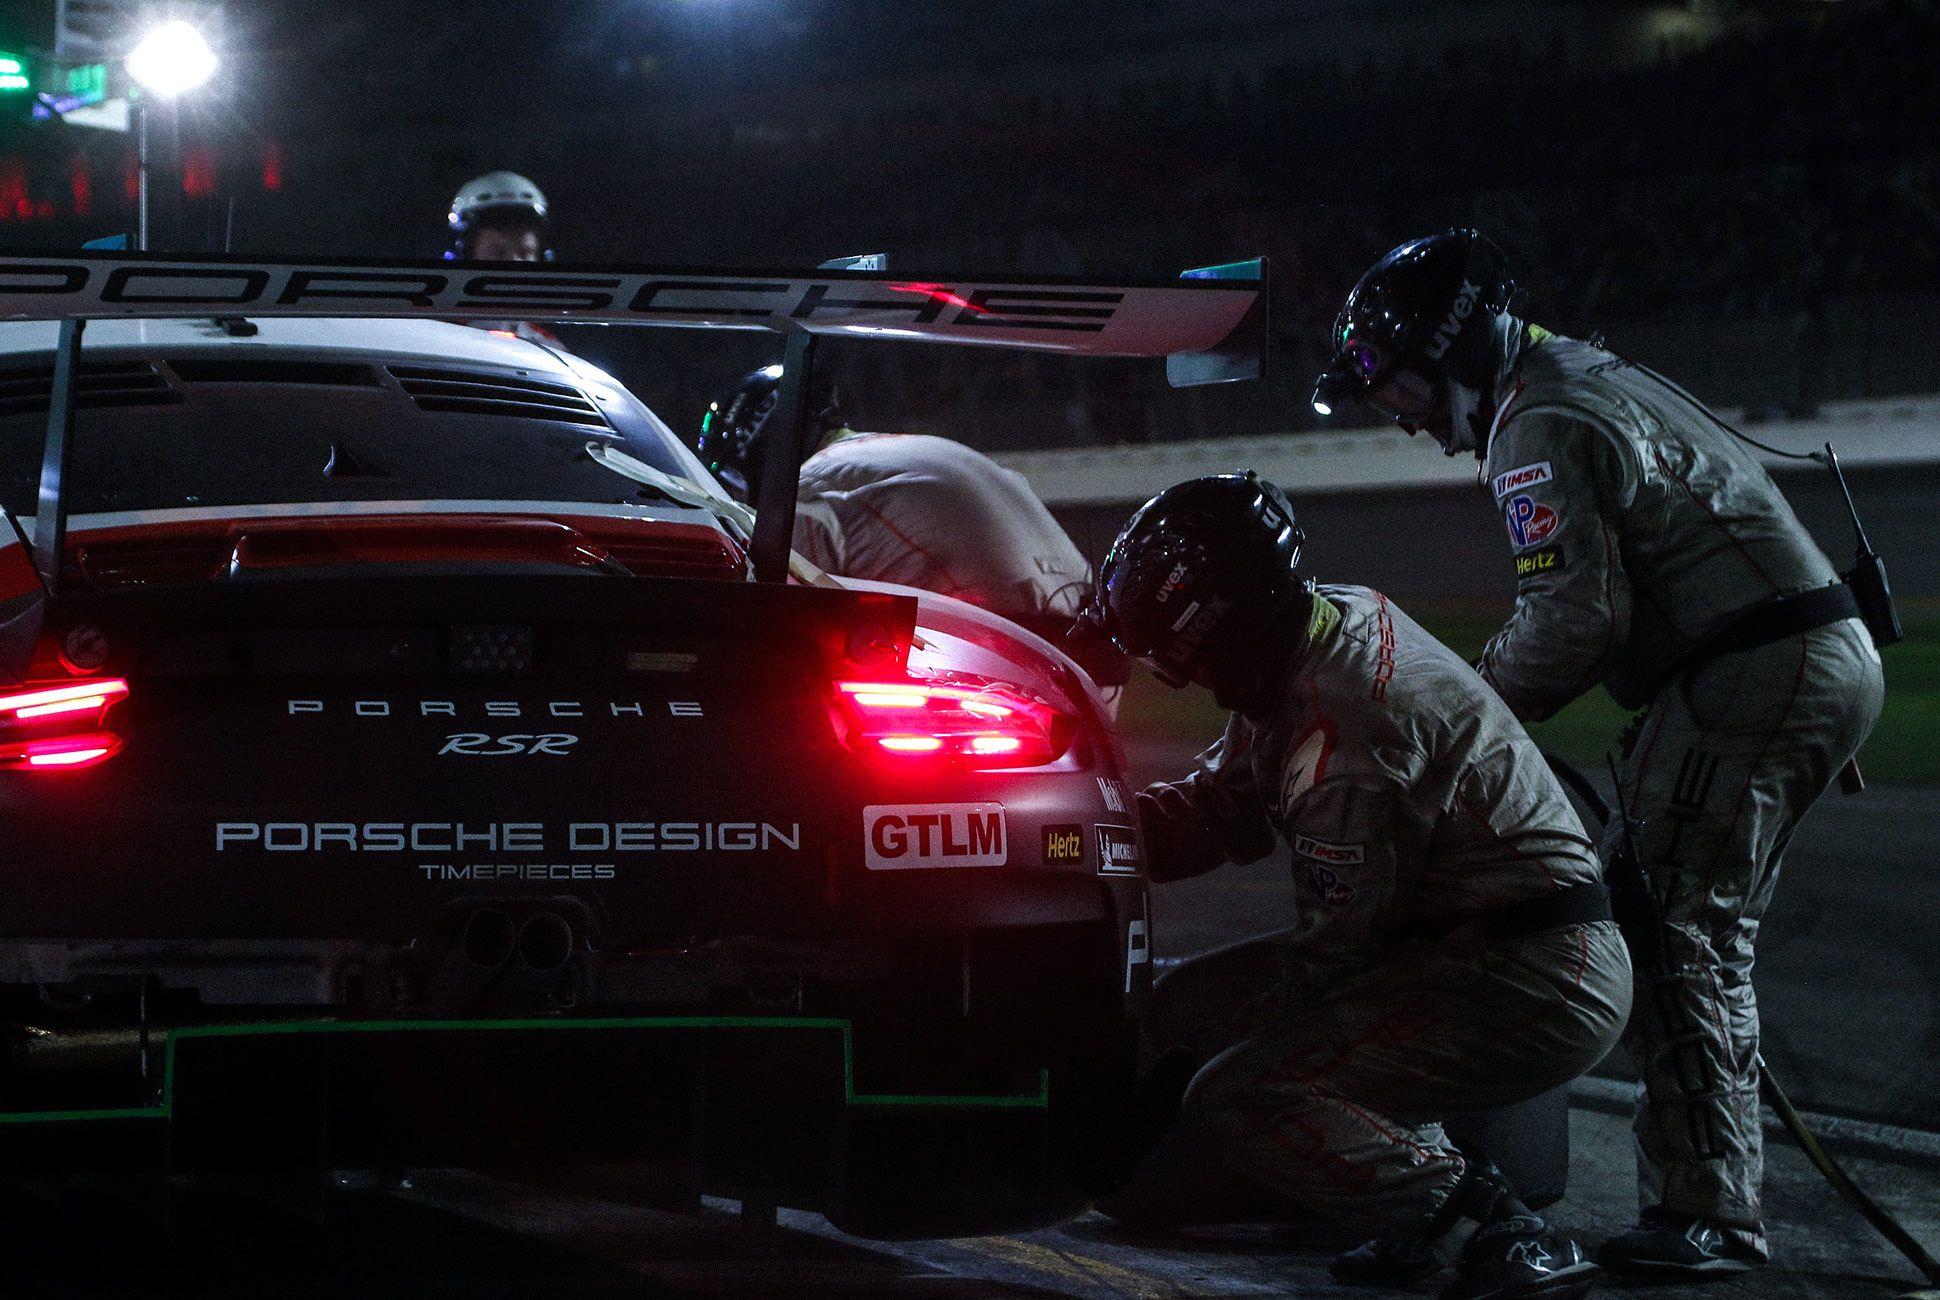 Best-Sports-Cars-of-2018-Daytona-24-Hours-gear-patrol-Porsche-911-RSR-3